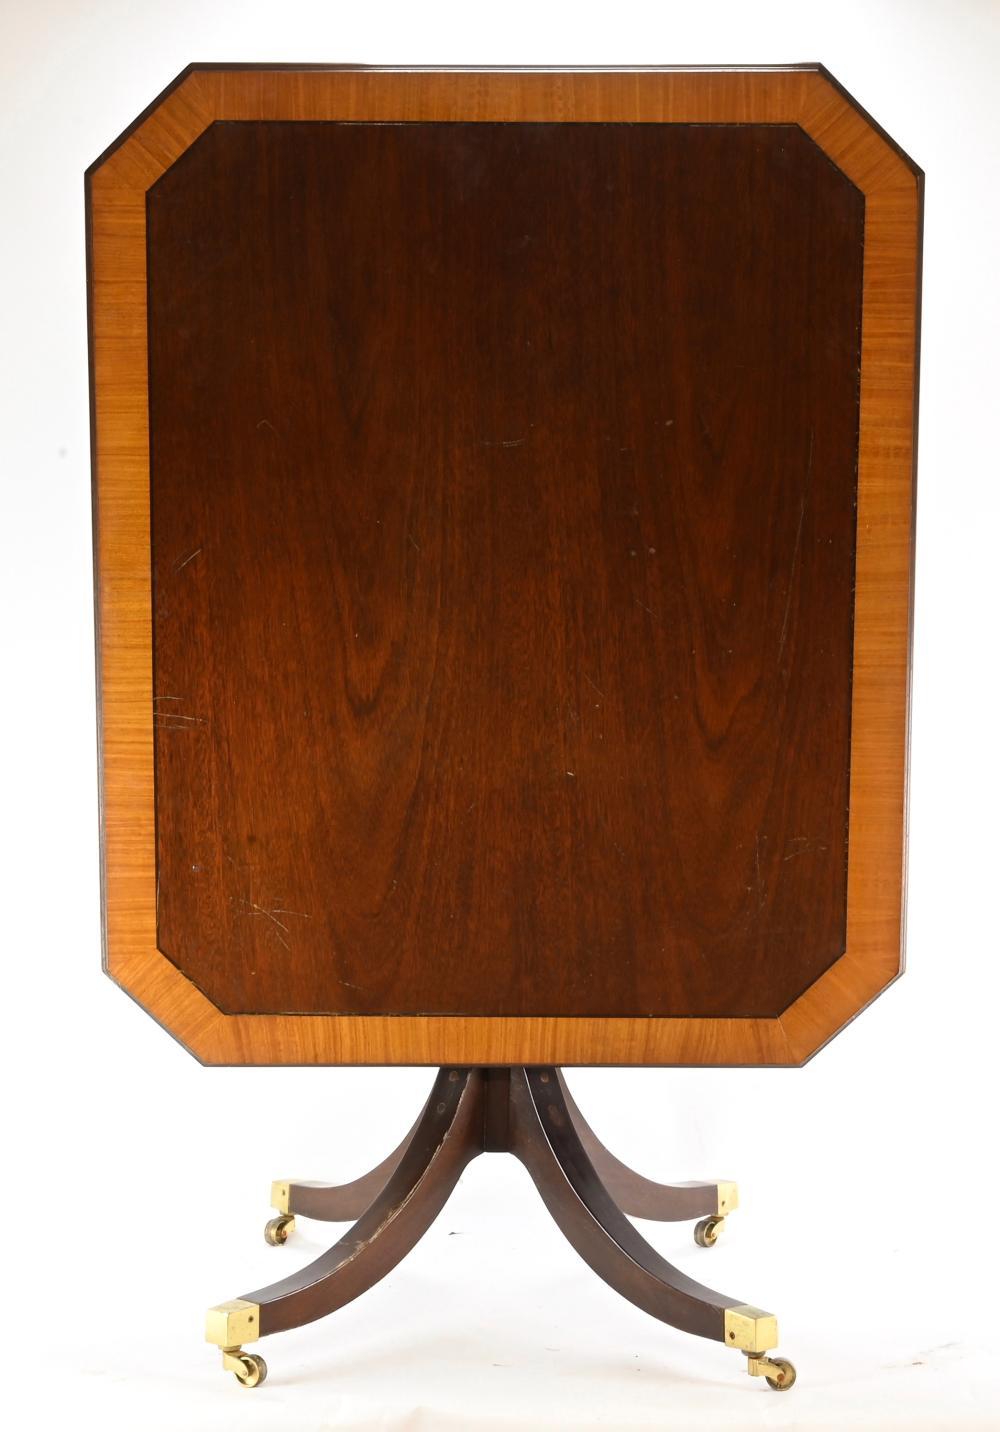 Formal Mahogany Duncan Phyfe Tilt Top Card Table